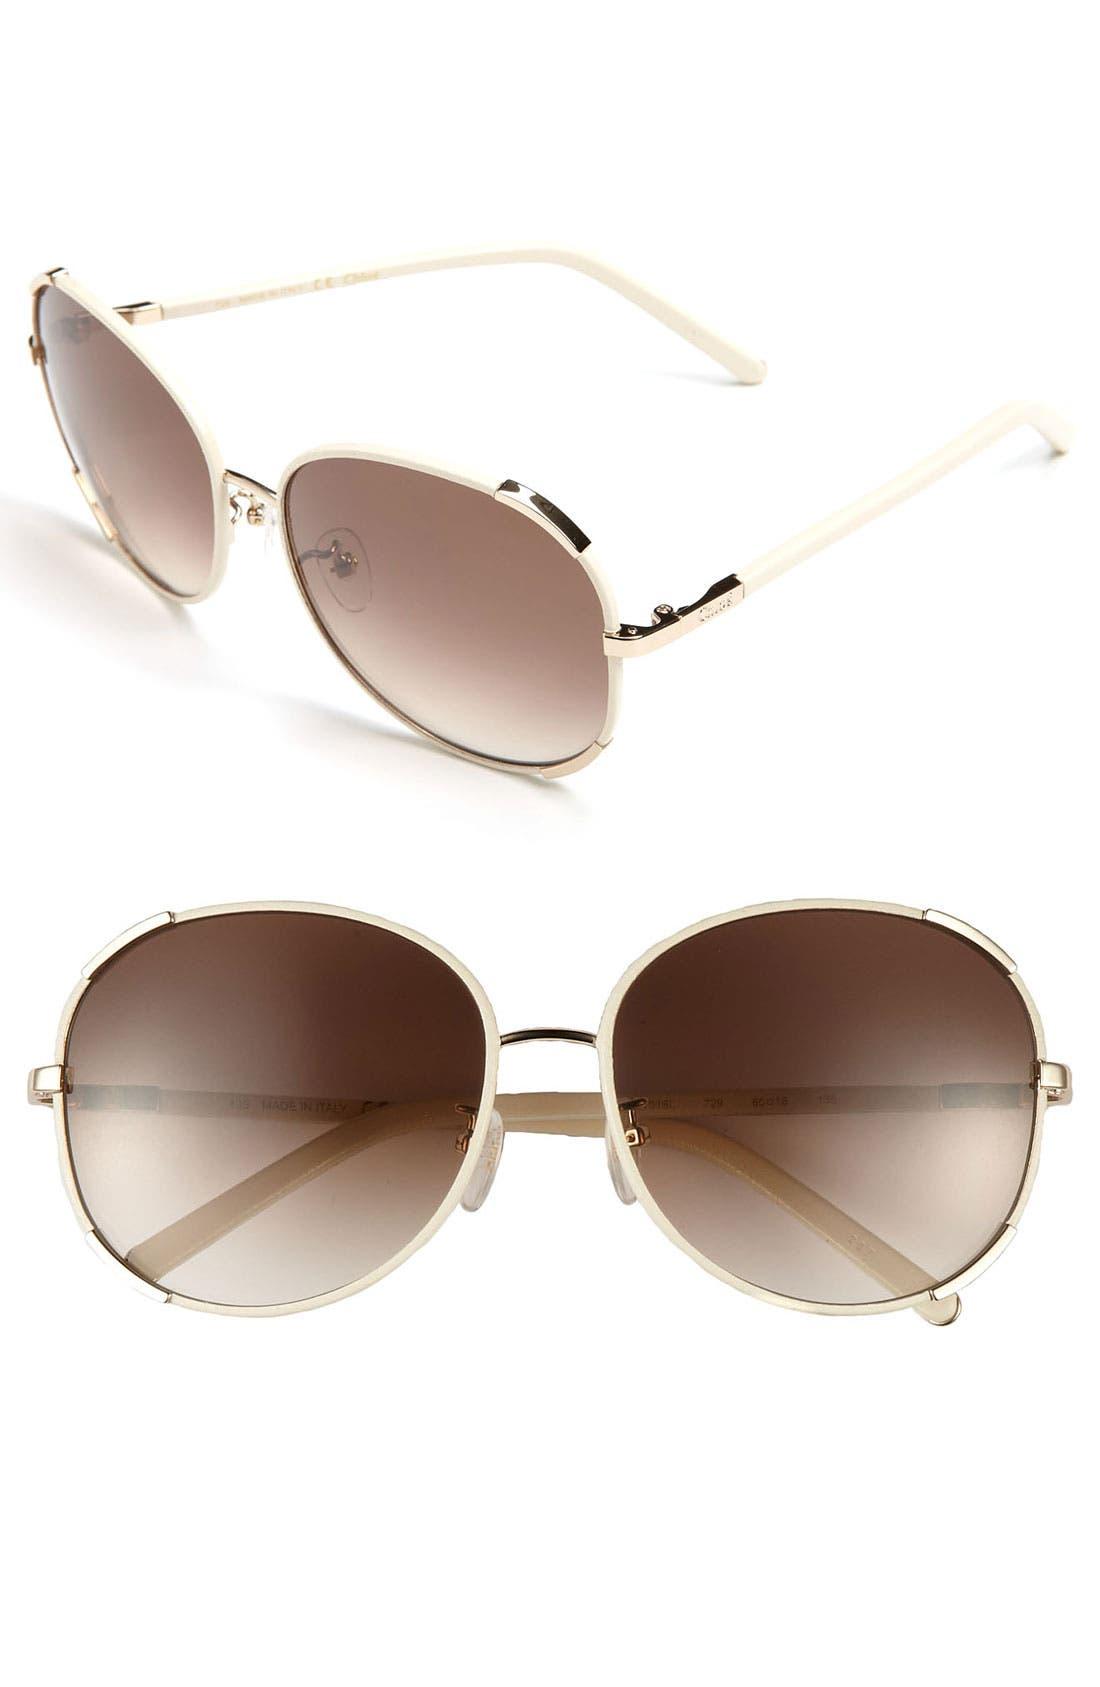 Alternate Image 1 Selected - Chloé 60mm Retro Sunglasses